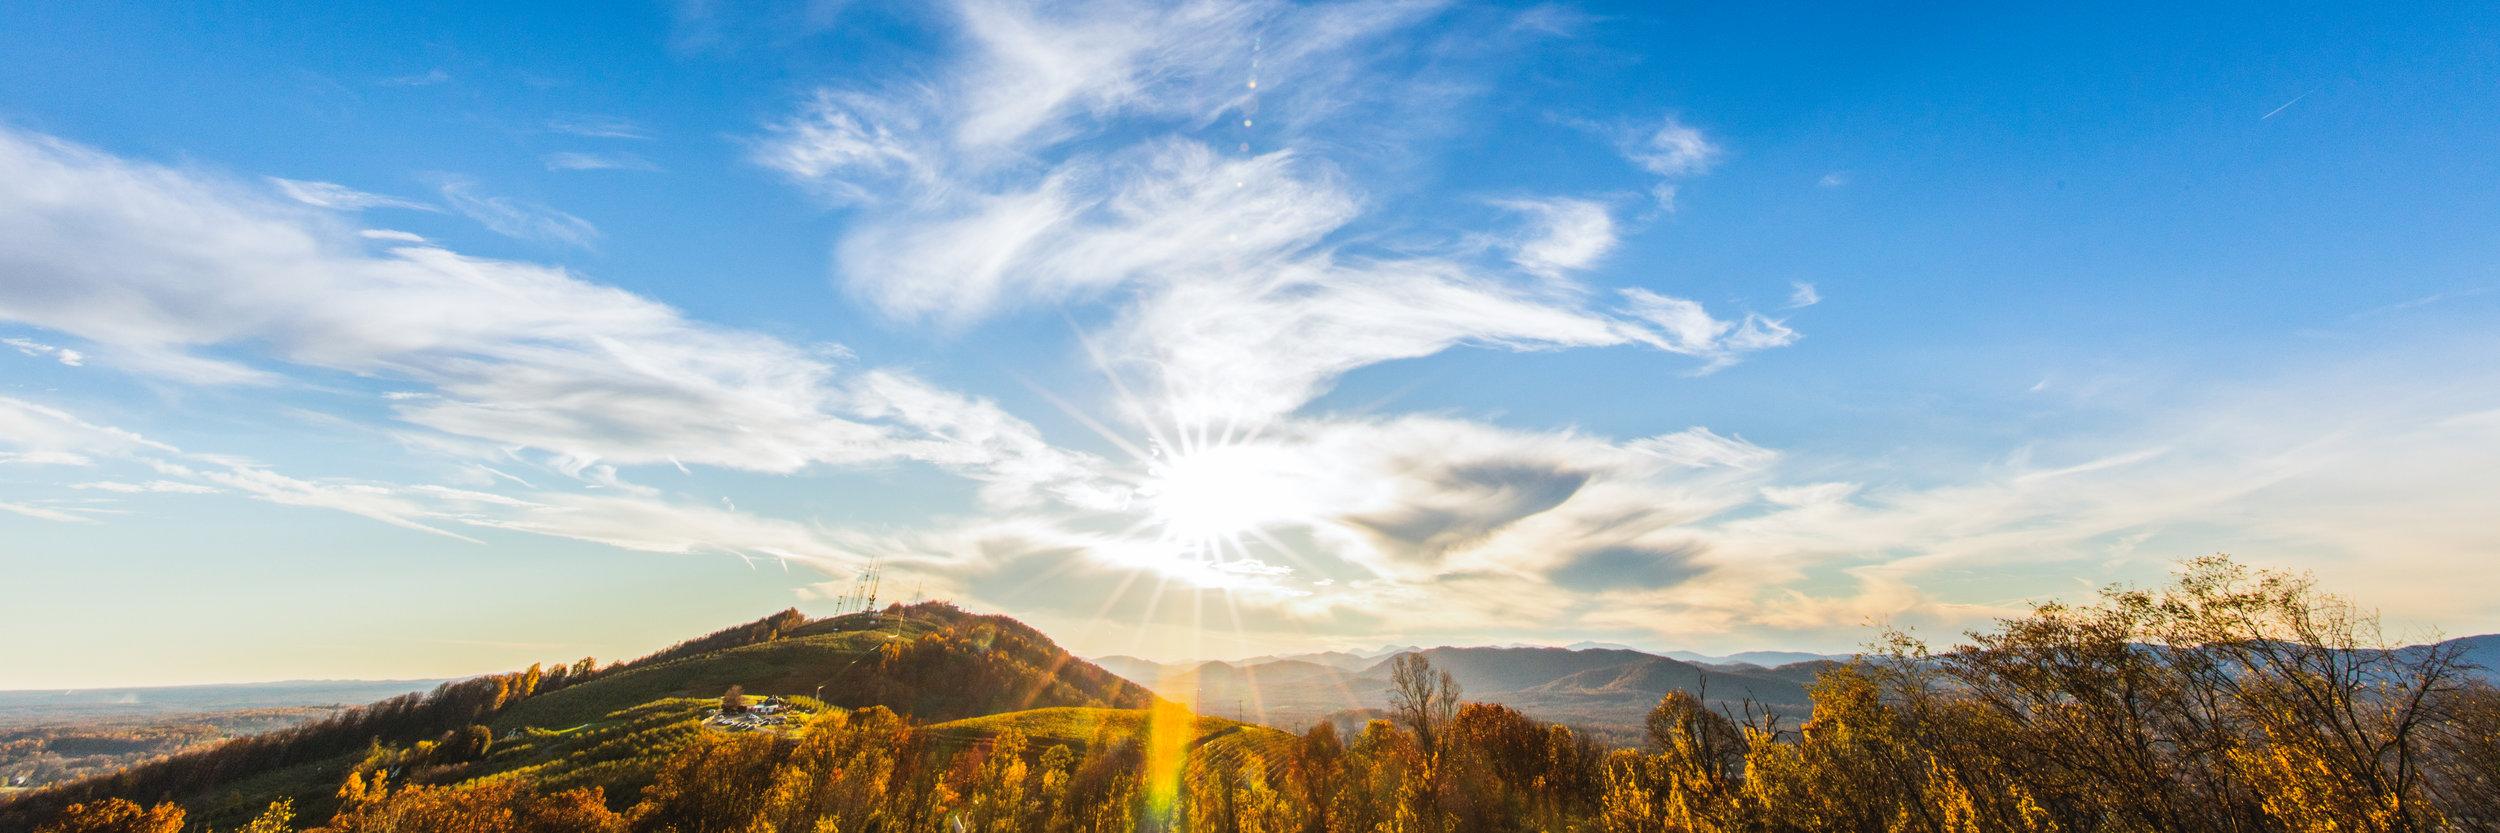 Image: Aaron Watson Photography and Carter Mountain Orchard